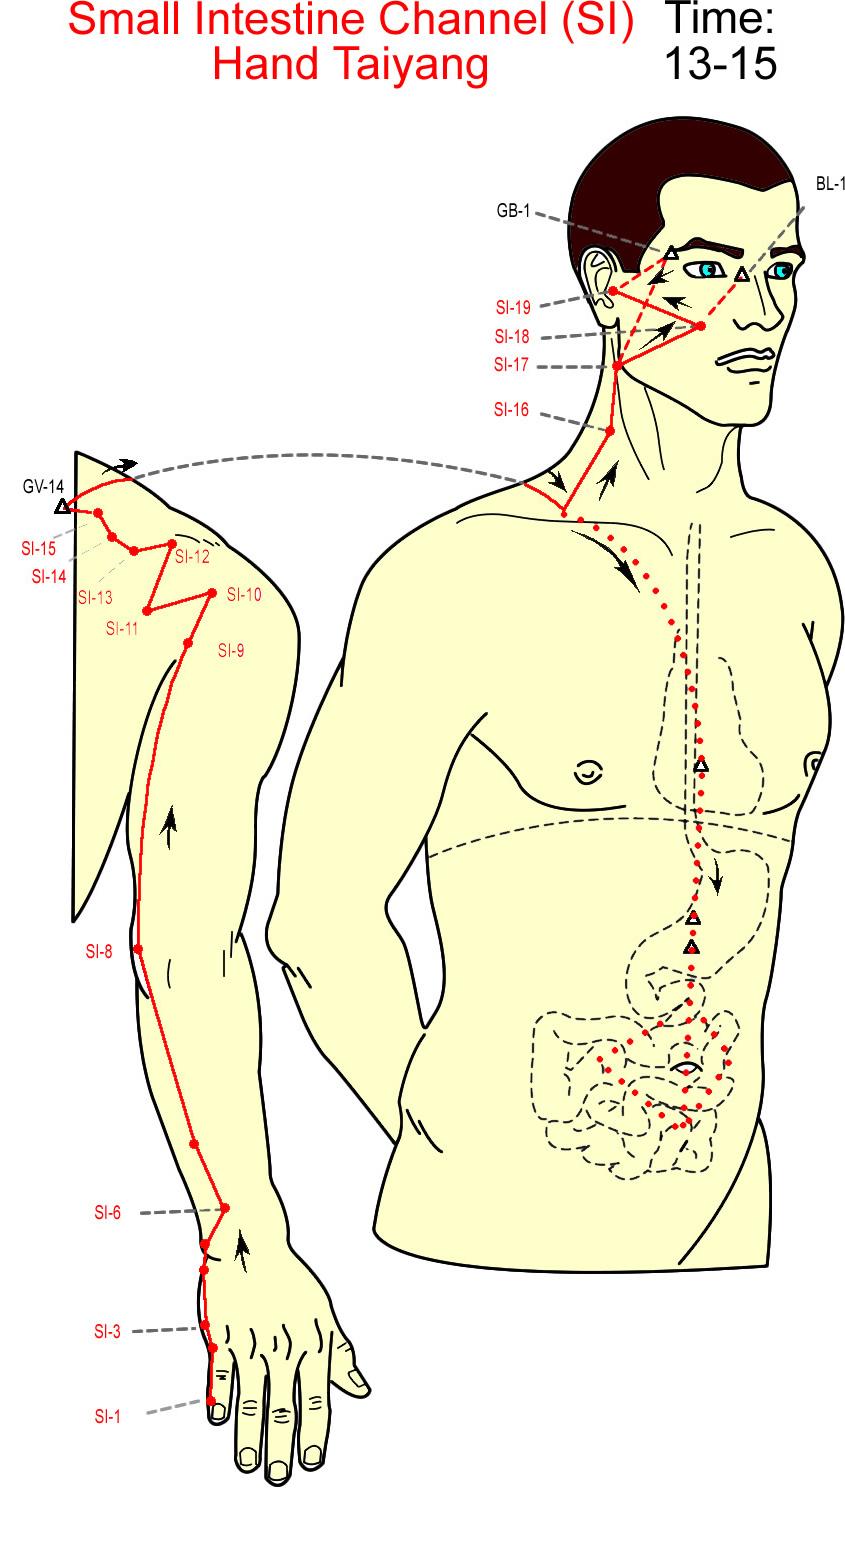 meridian usus kecil - small intestine